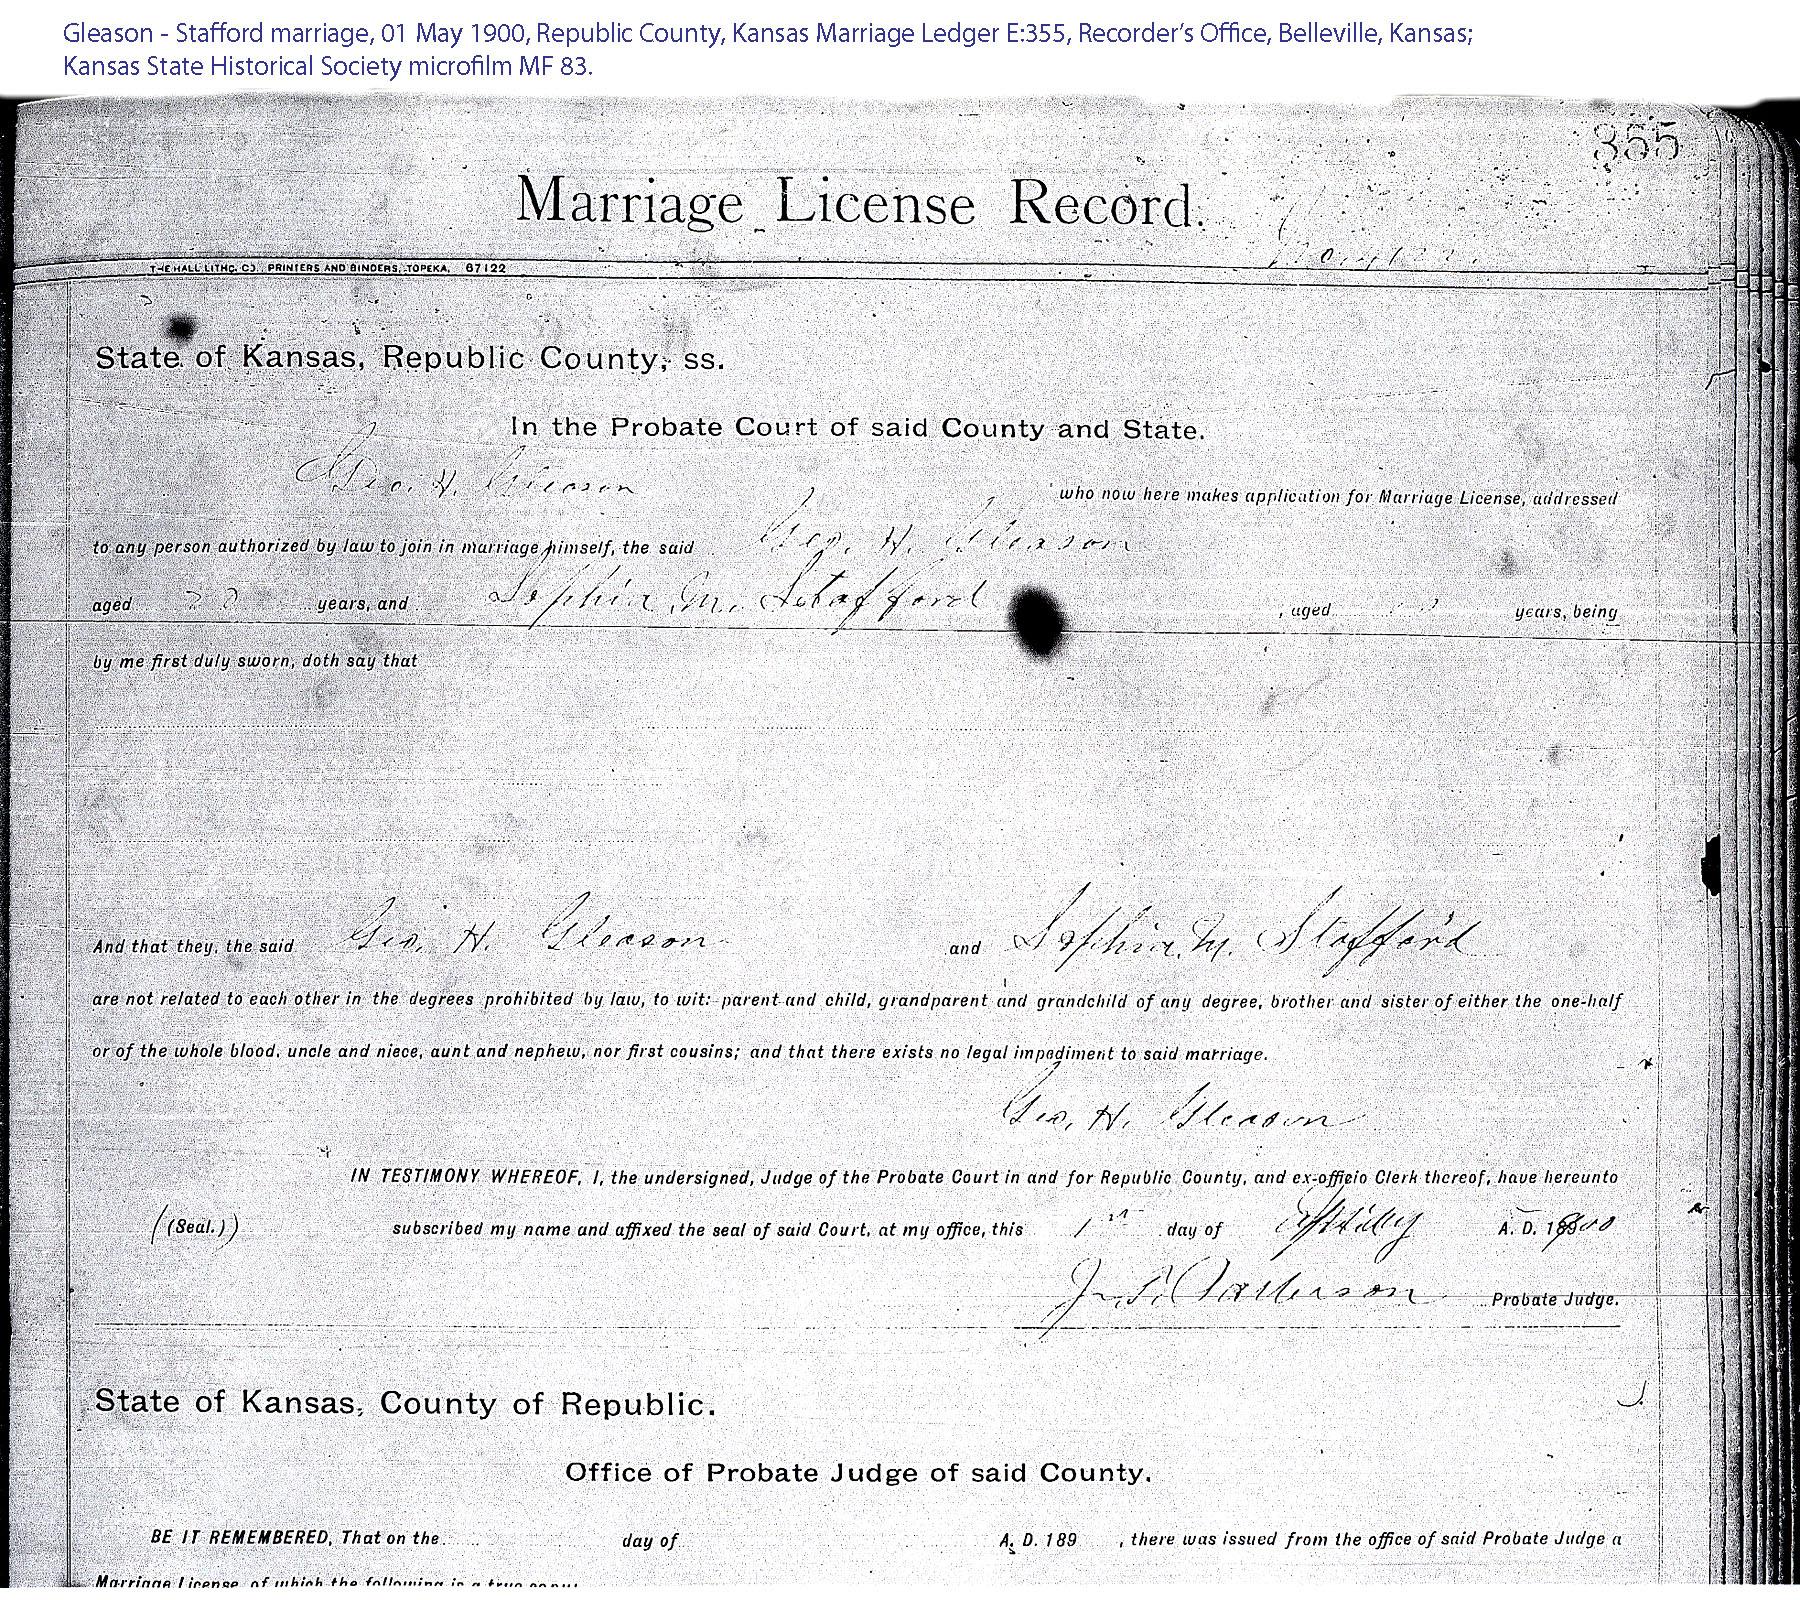 Kansas republic county agenda - Gleason Stafford Marriage Record 01 May 1900 Republic County Kansas